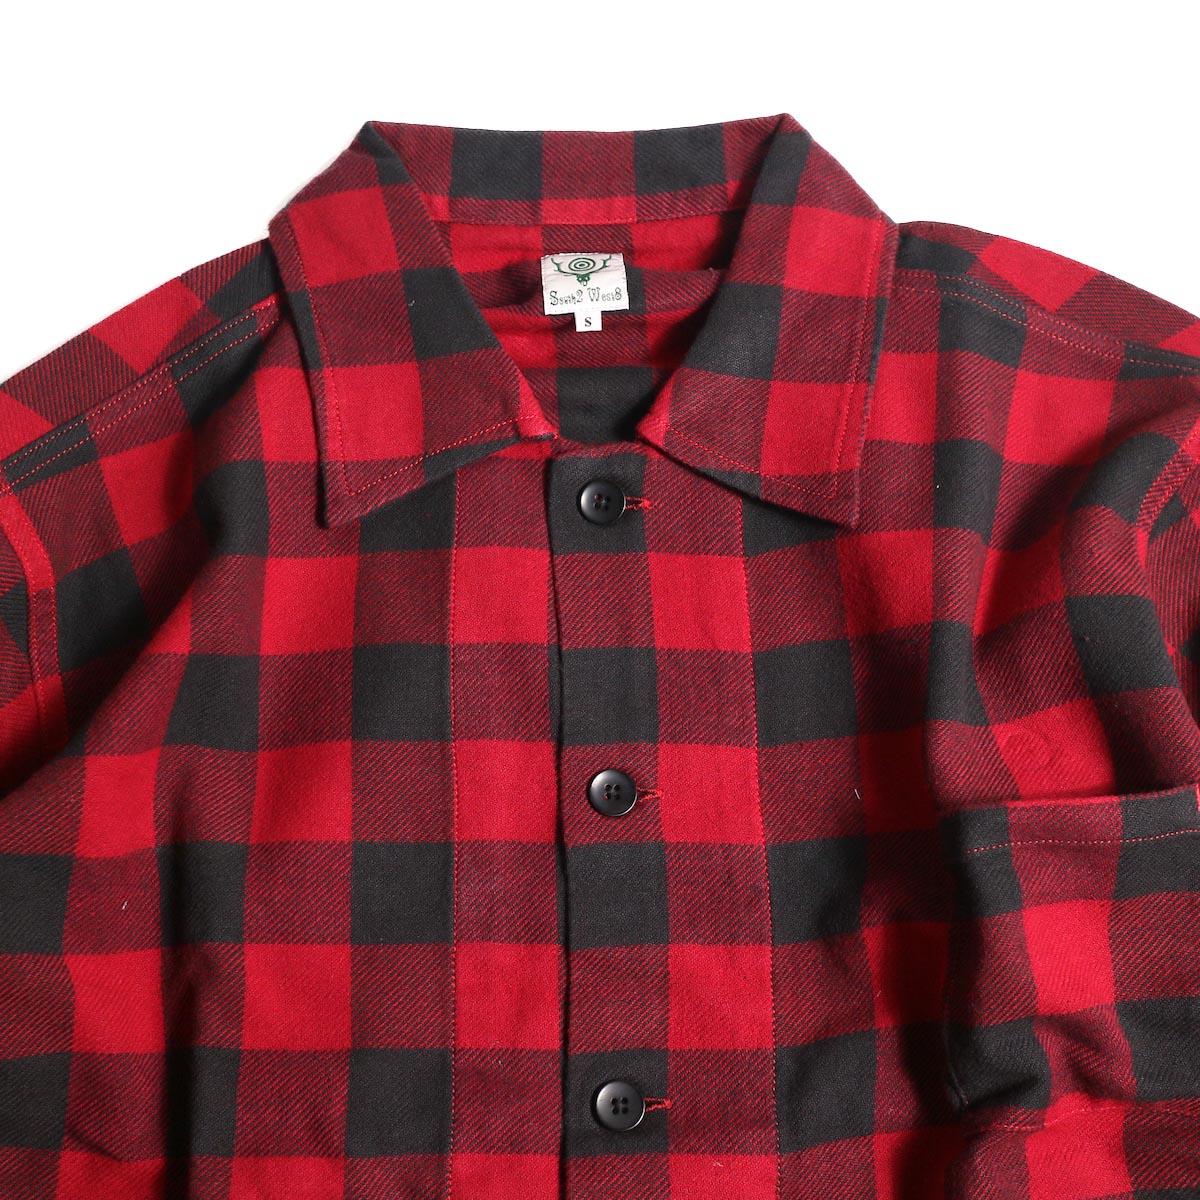 South2 West8 / Hunting Shirt -Plaid Twill (Red/Black)襟